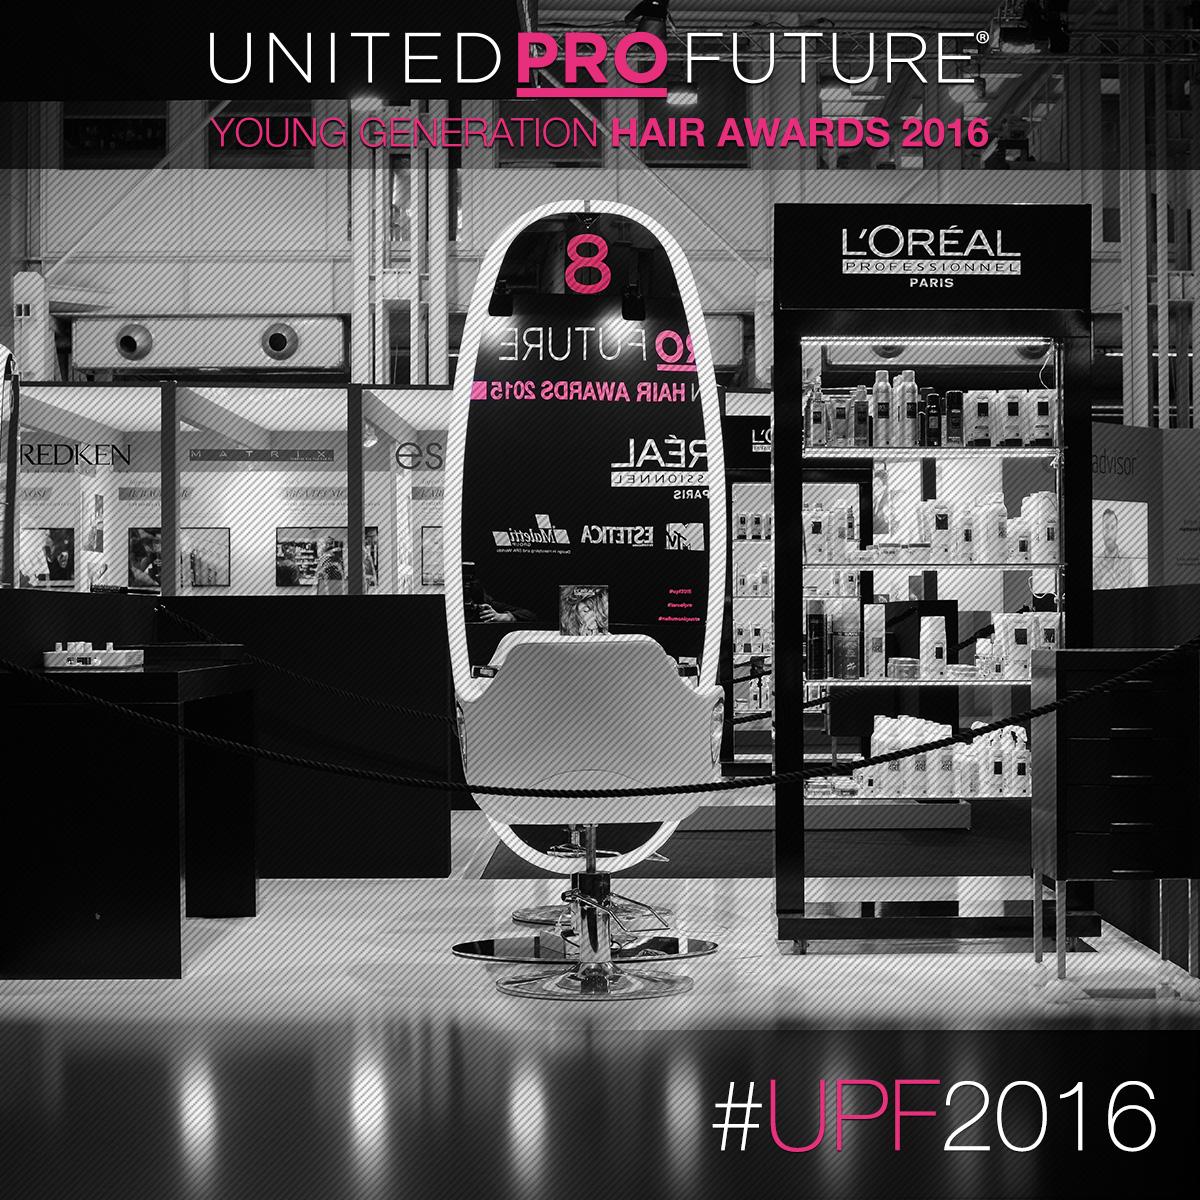 UPF 2016 foto ufficiali 2